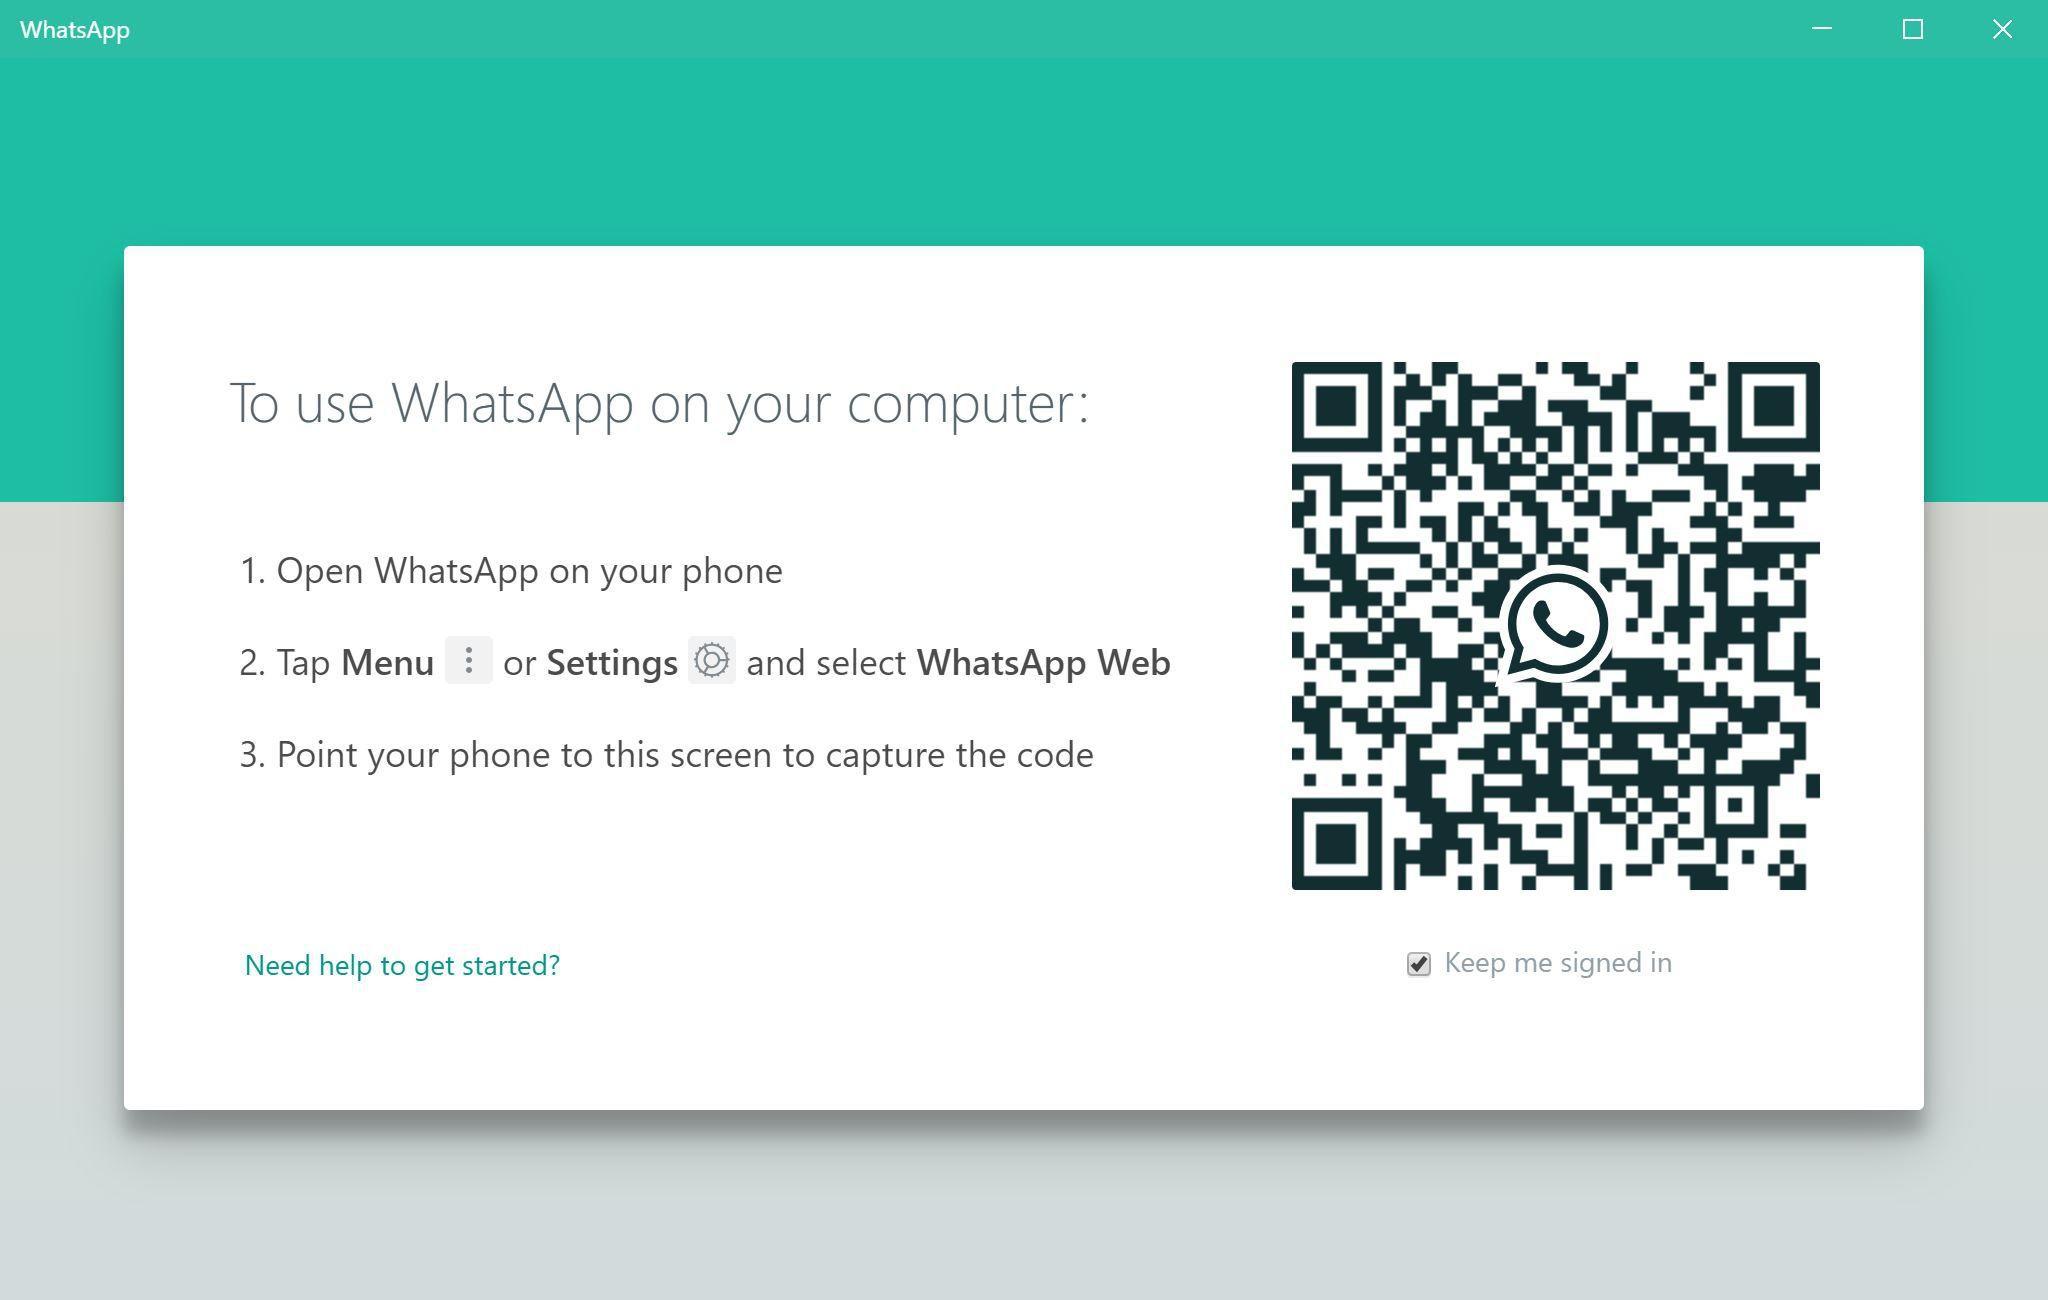 whatsapp-windows-10-login